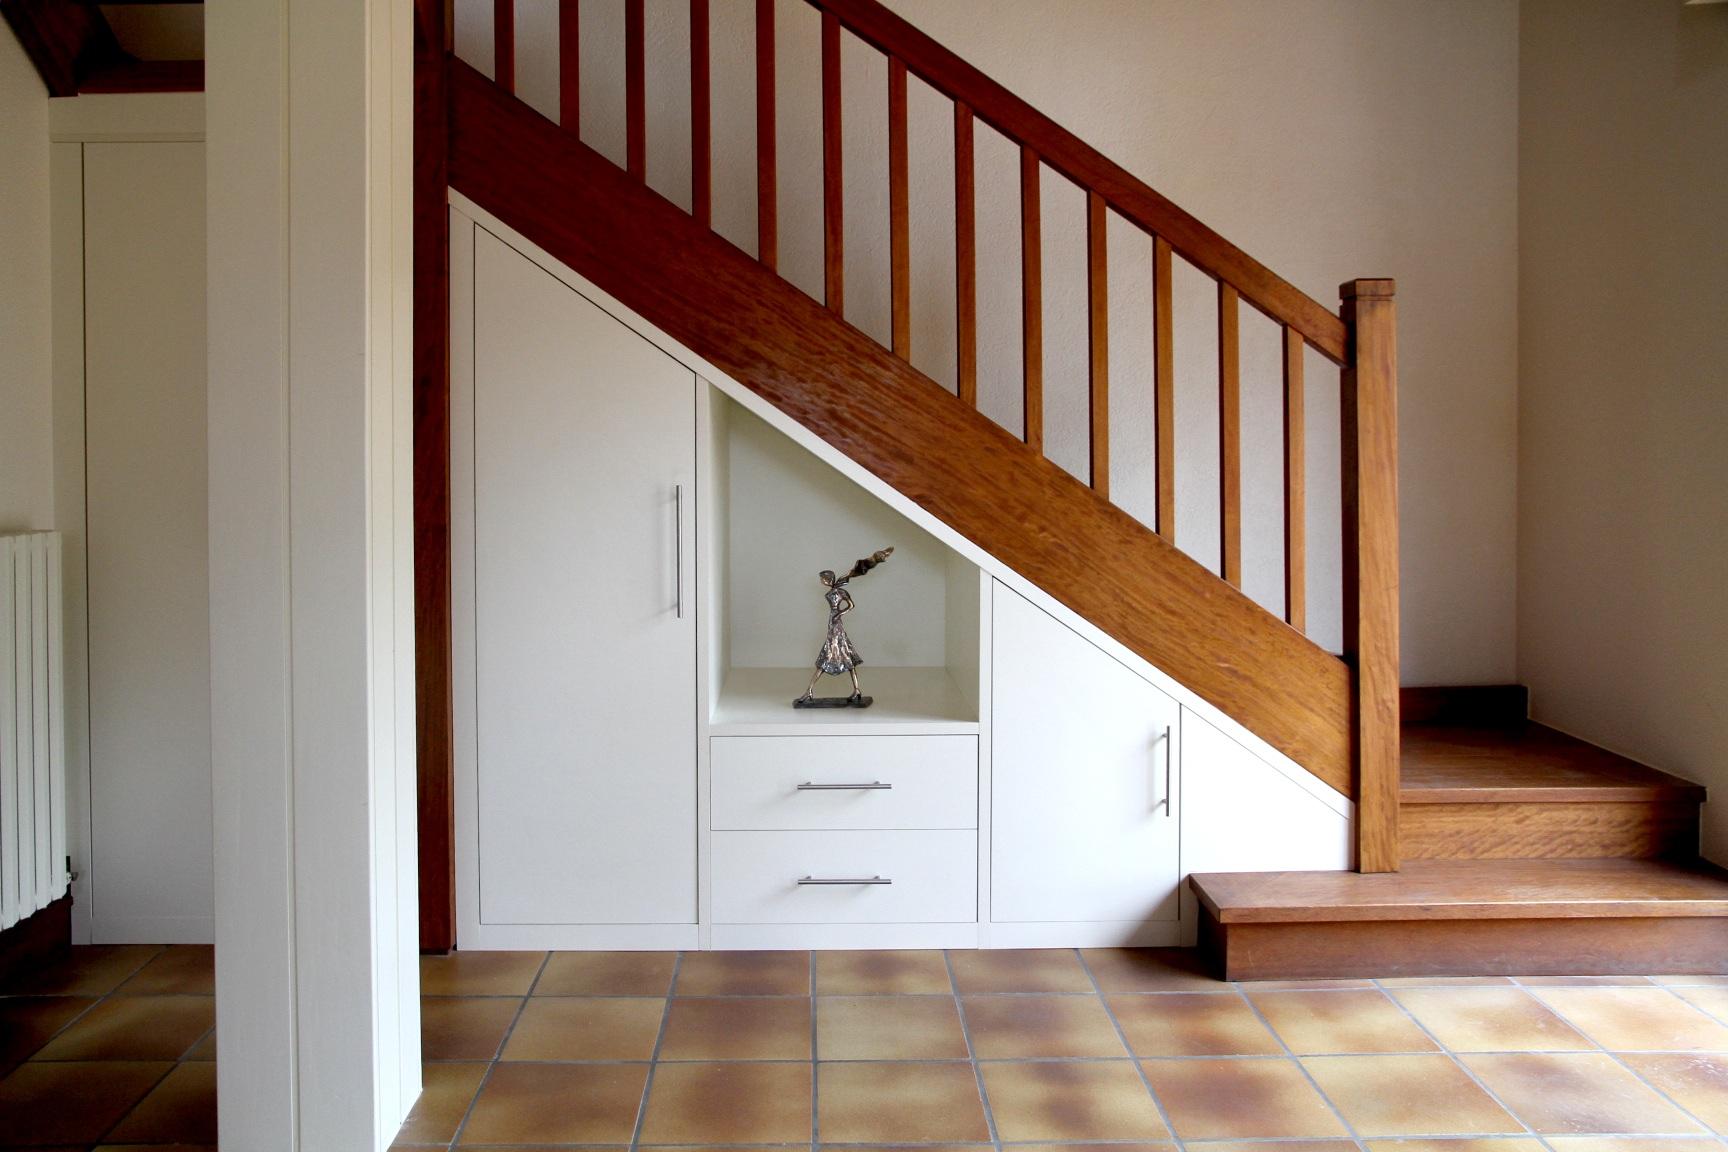 Rangement Sous Escalier Leroy Merlin Beautiful Ikea